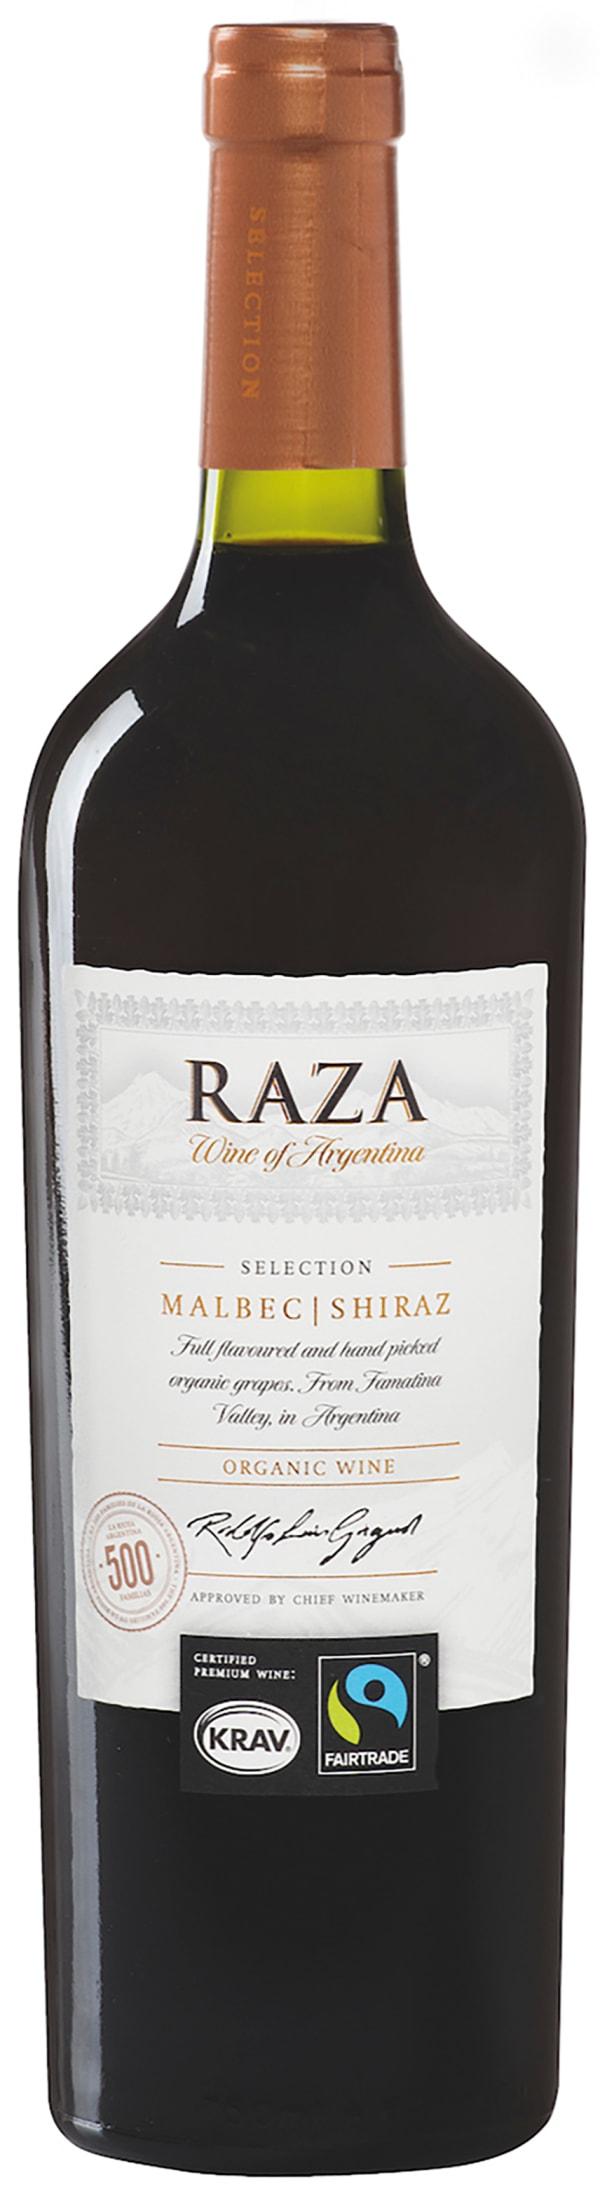 Raza Selection Malbec Shiraz Organic 2016